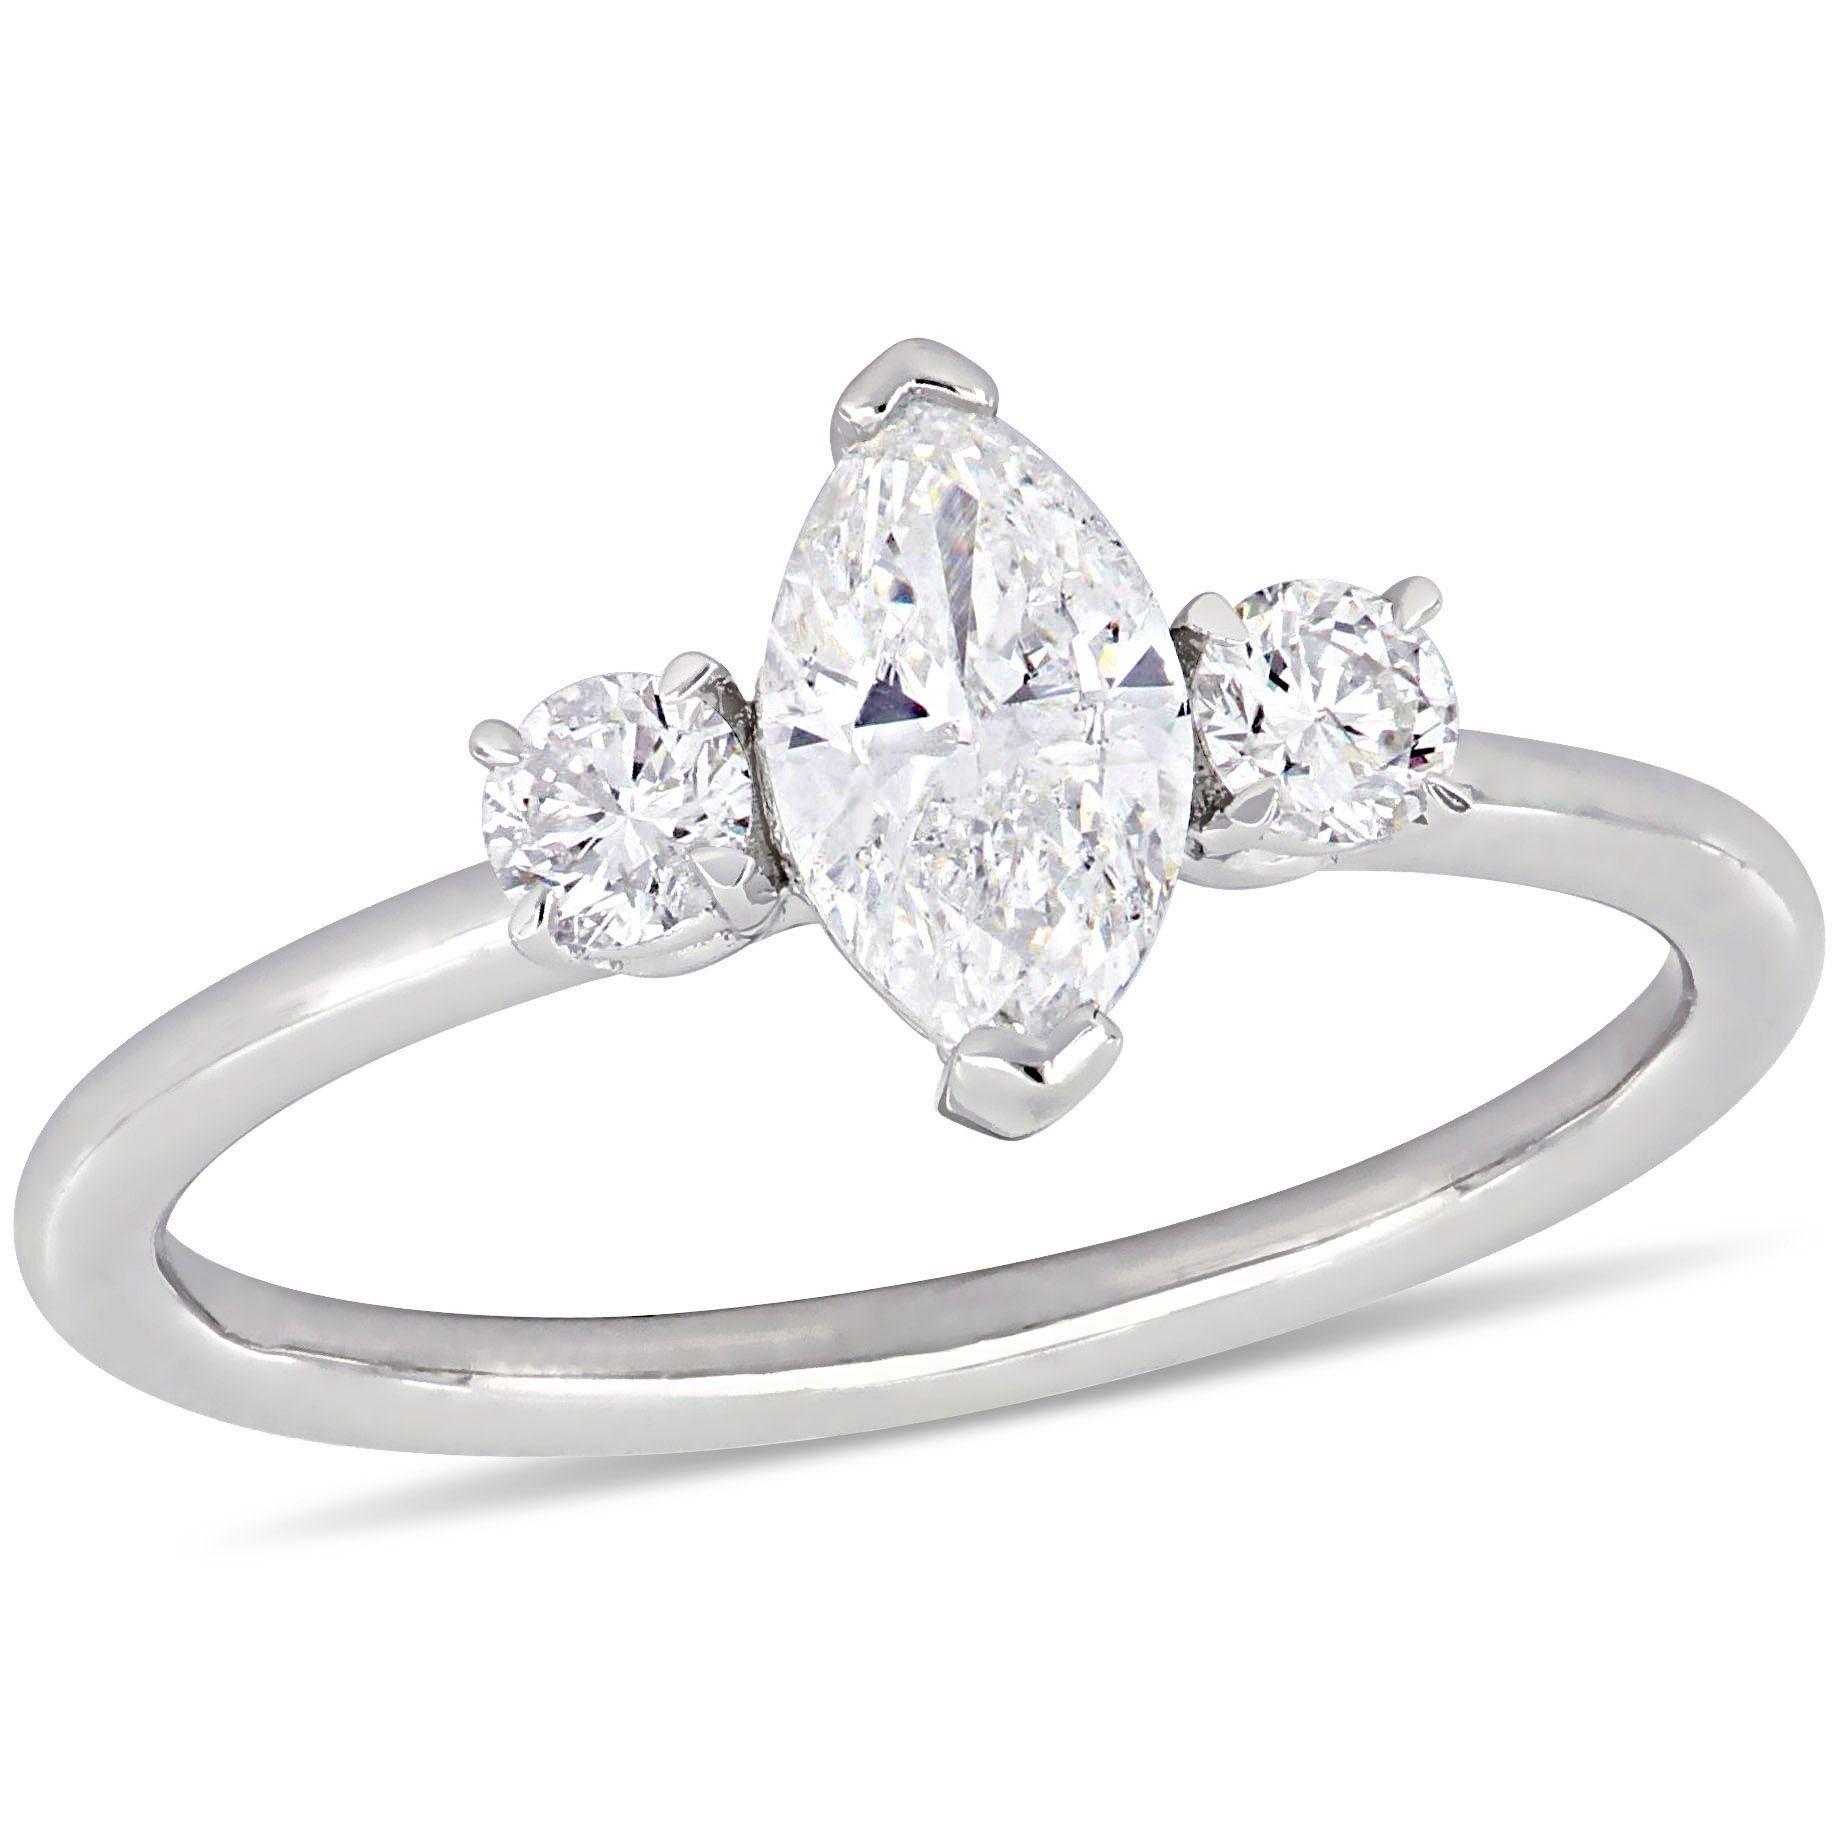 ThreeStone Marquise & Round 1ctw. Diamond Engagement Ring